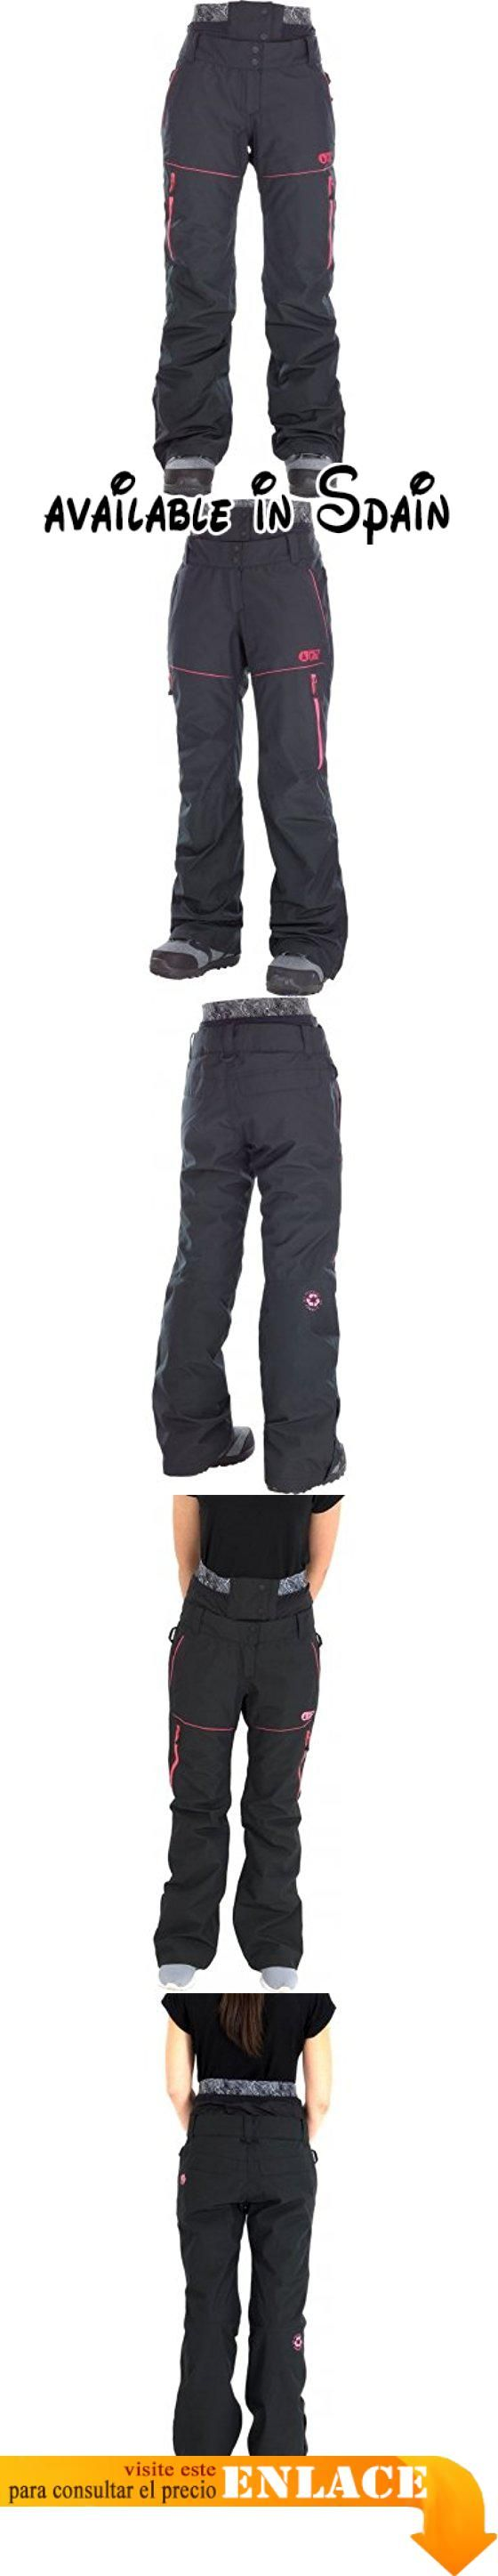 B075F8YPS8 : Picture Organic Clothing Exa Pant Pantalones para la Nieve para Mujer Negro (Black) (Tamaño del Fabricante:S). #Ropa #OUTERWEAR